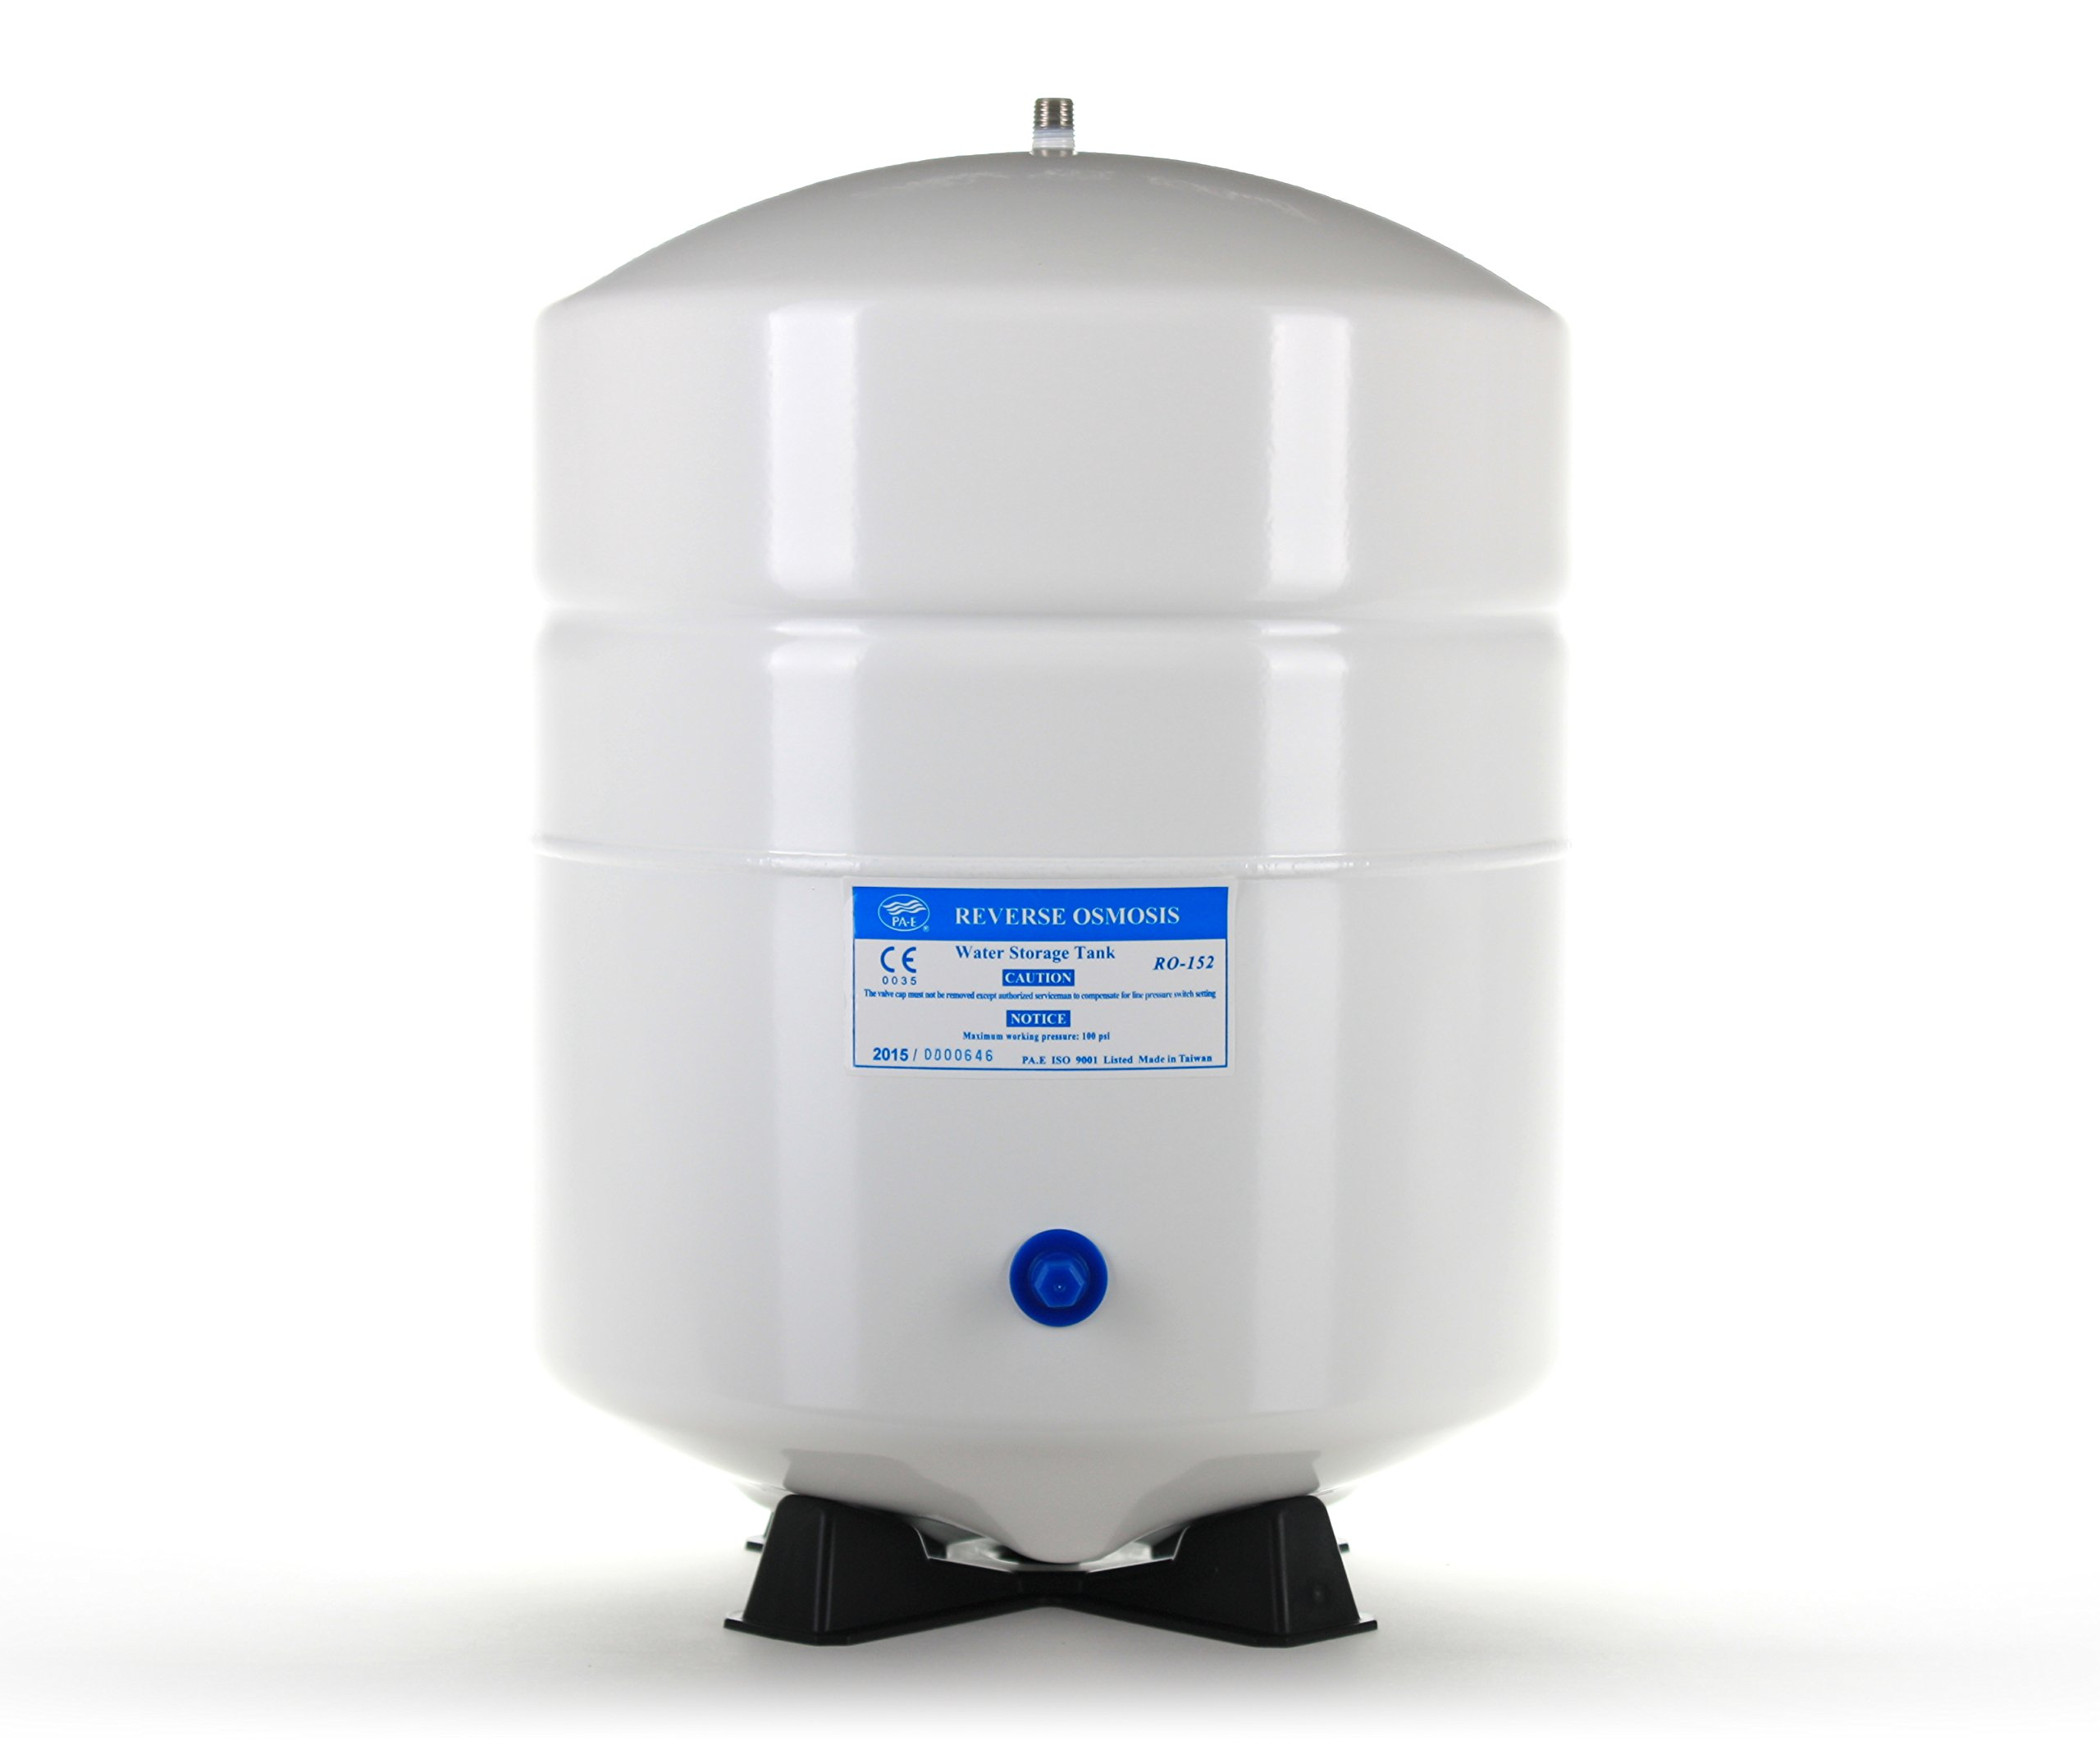 Hydronix RO-152-W14 Reverse Osmosis 6 Gallon (5.5 Draw-Down) Water Tank - White, 1/4'' Port